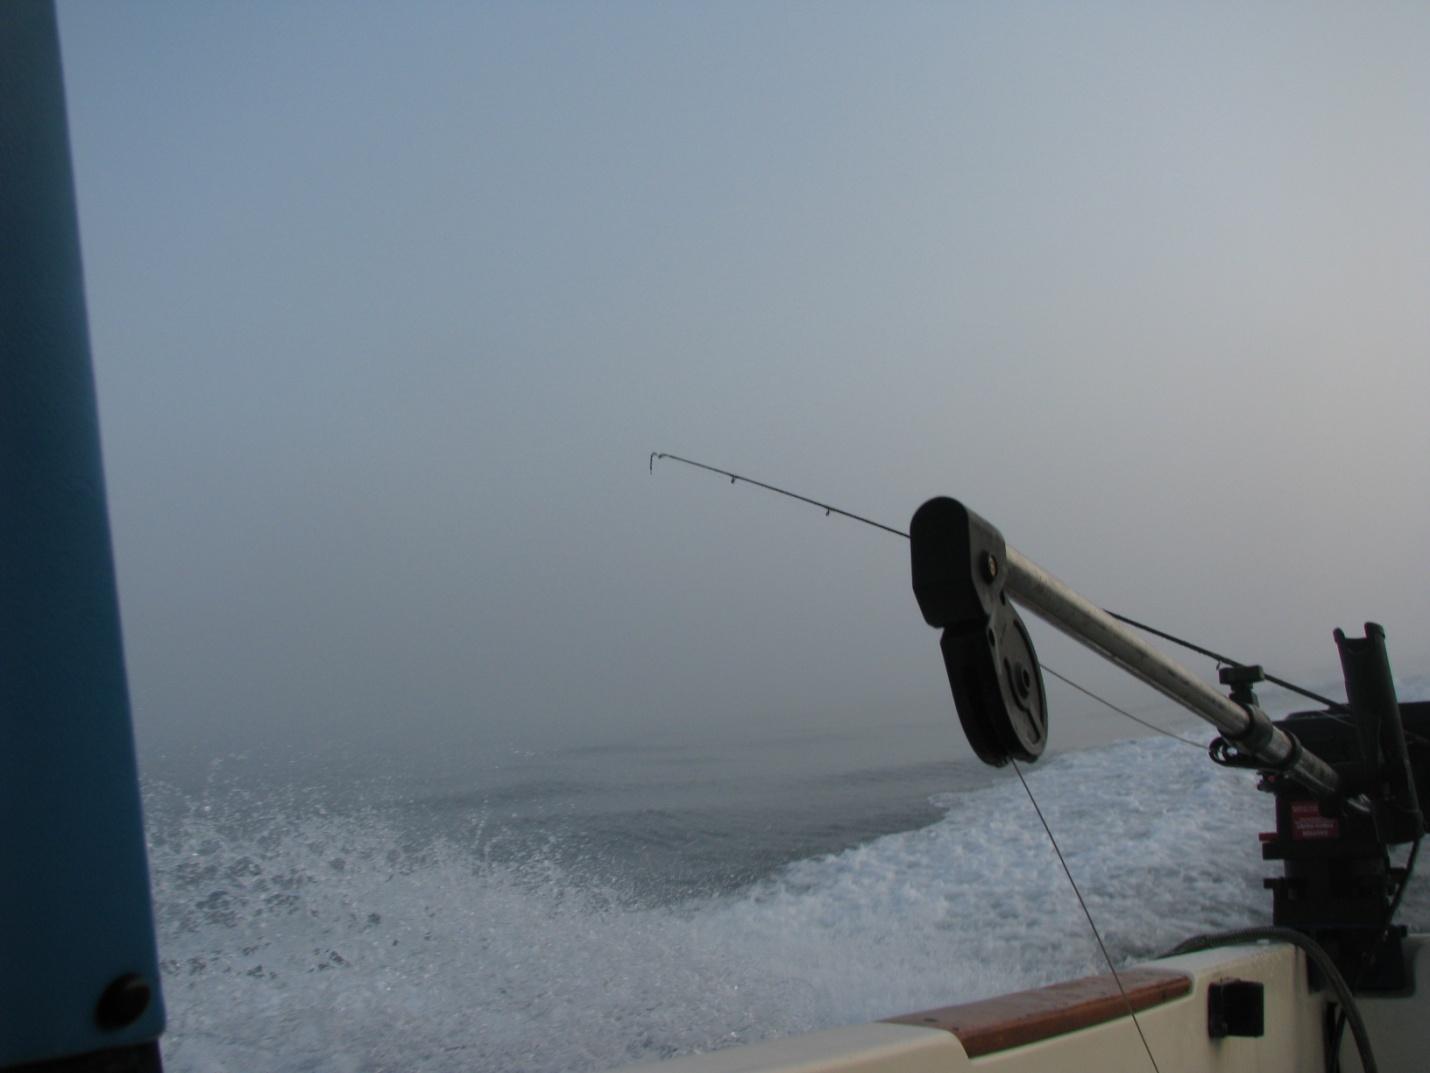 C:\Users\Russ\Desktop\Fishing\Fishing 046.jpg